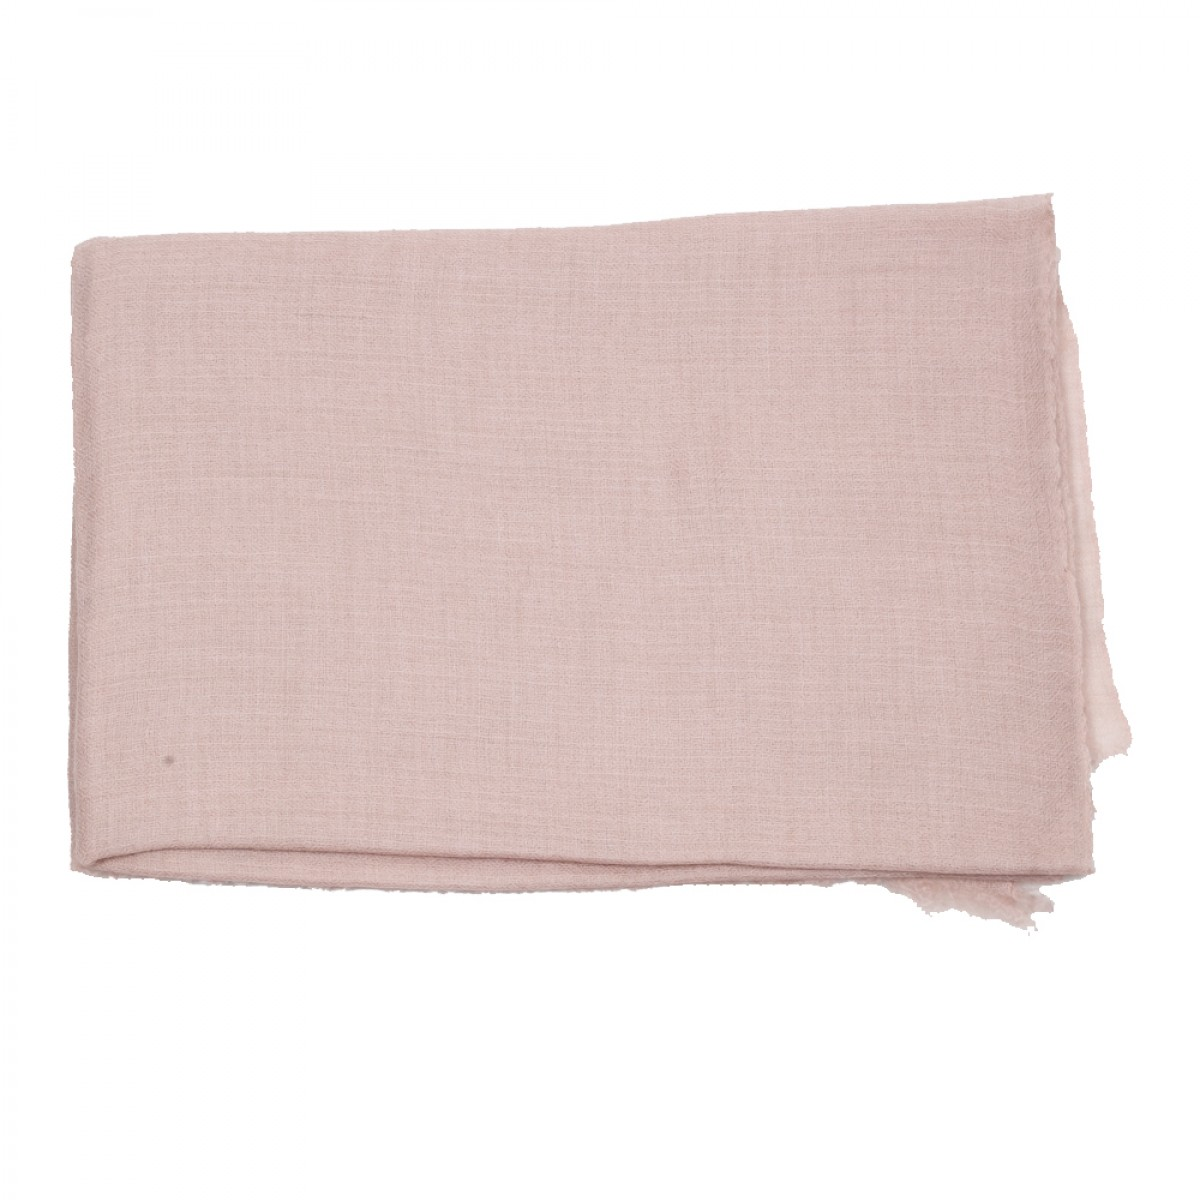 Plain Pashmina Stole - Pale Pink